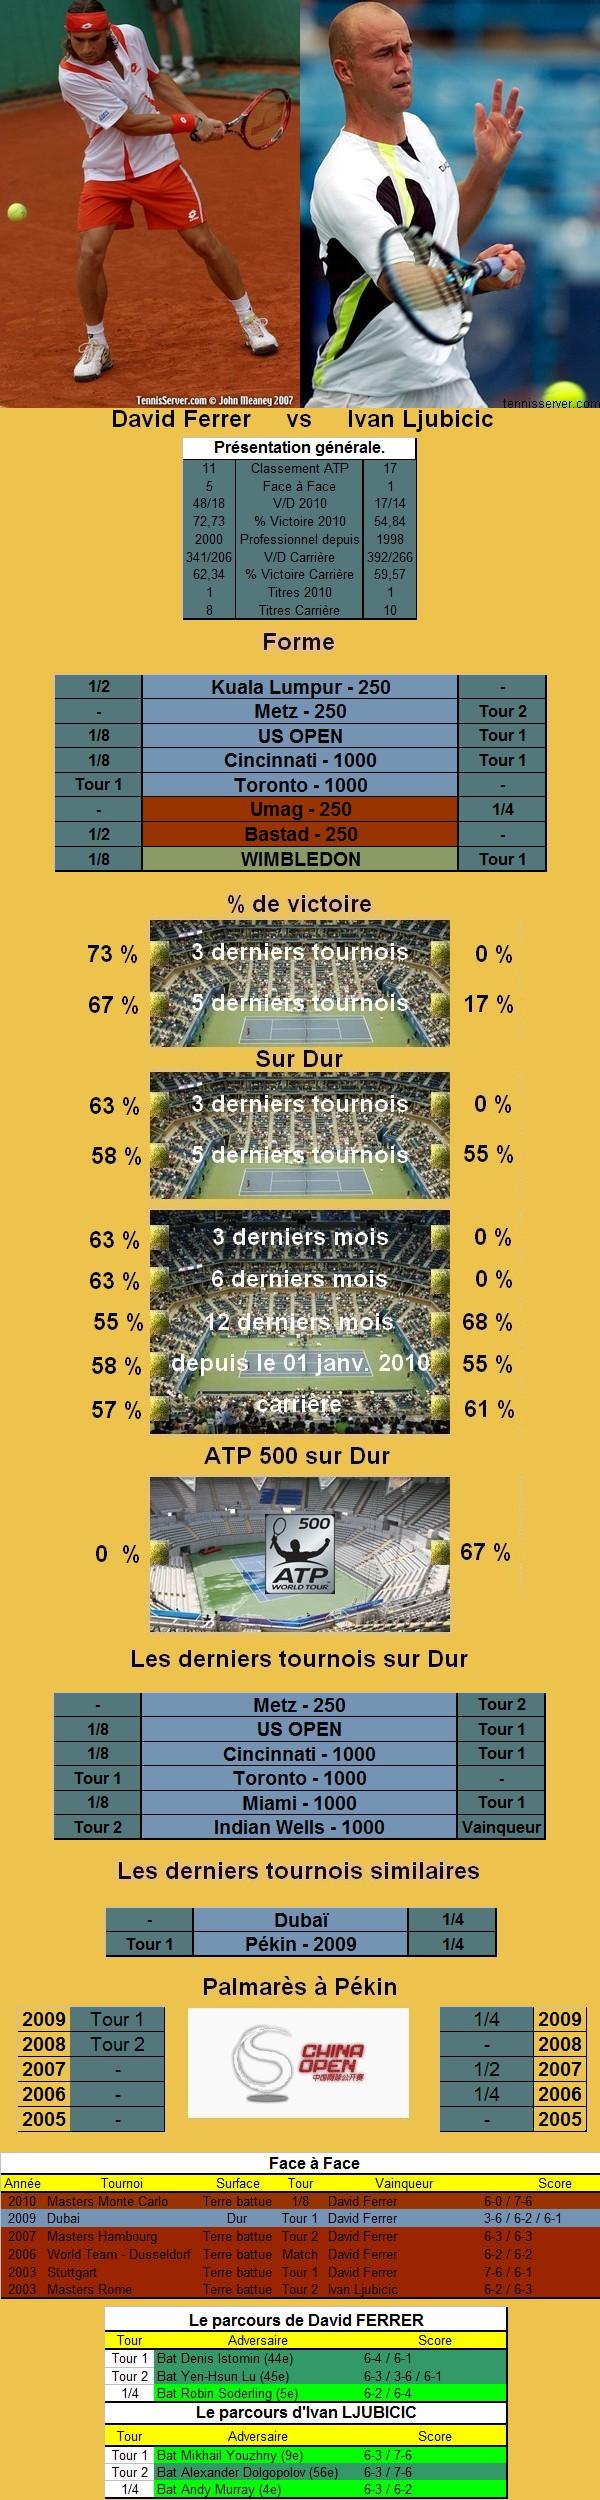 Statistiques tennis de Ferrer contre Ljubicic à Pekin